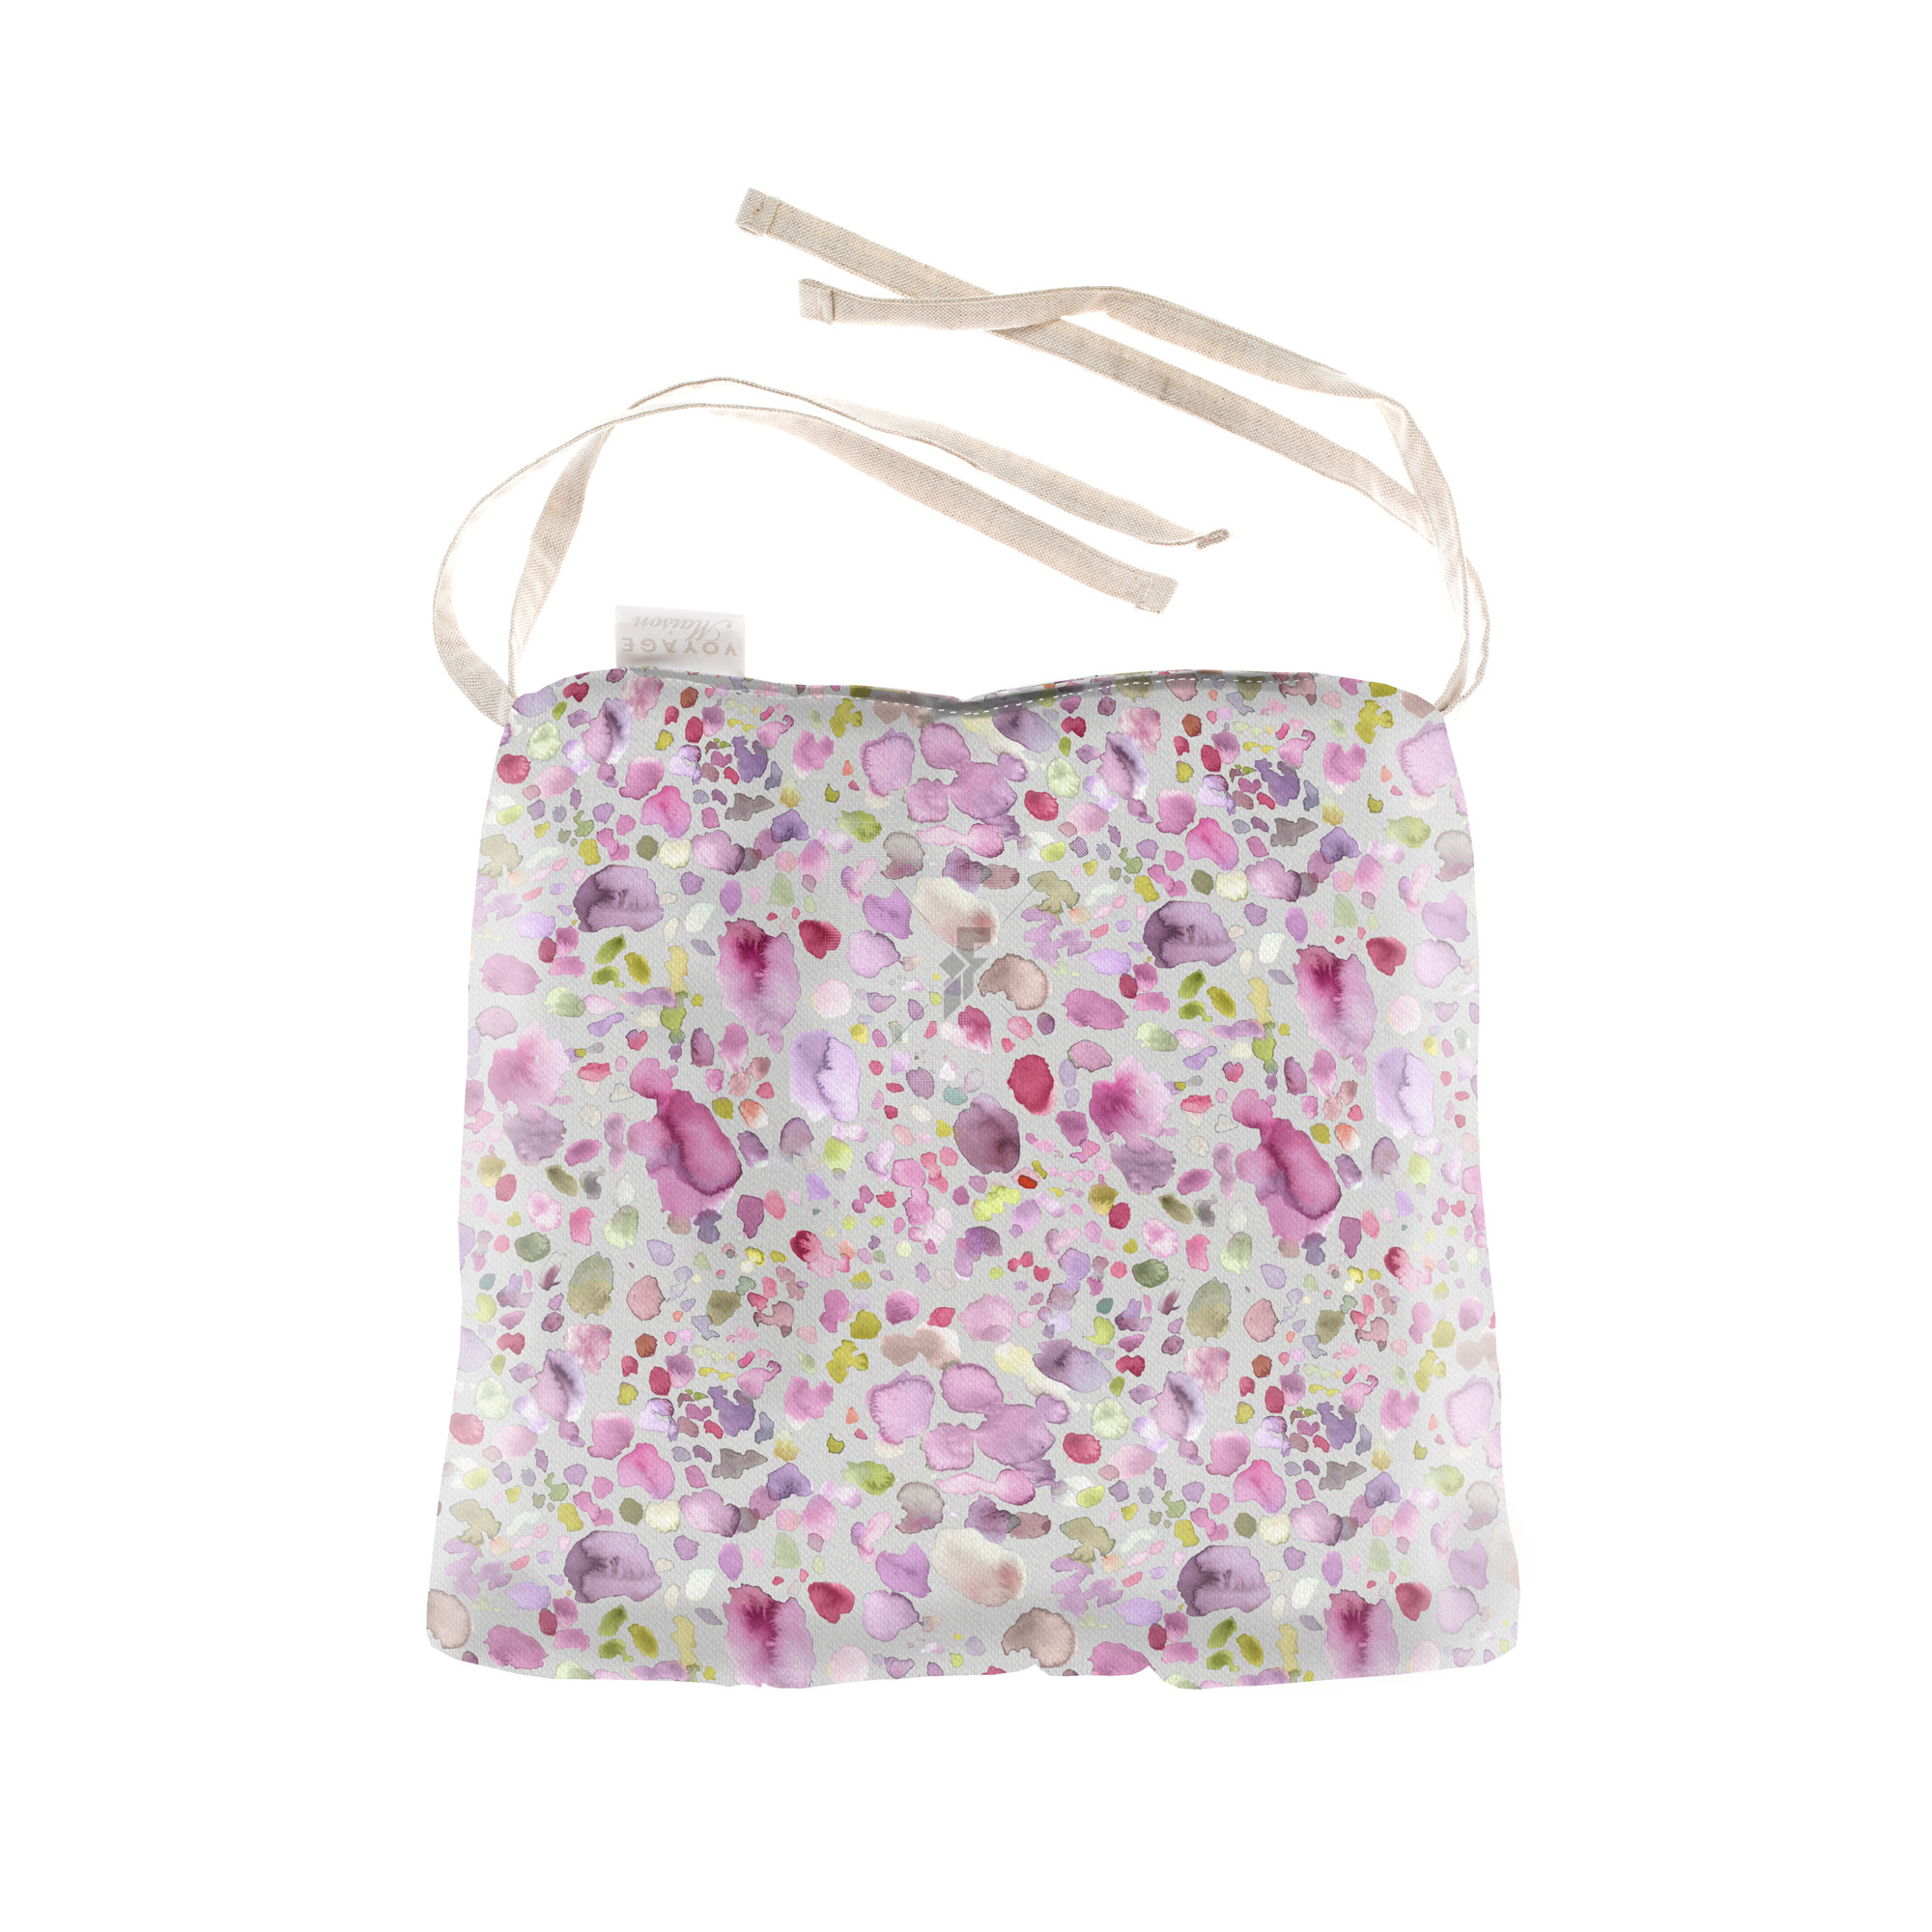 Voyage Maison Sprinkles Raspberry Cushion Seat Pad